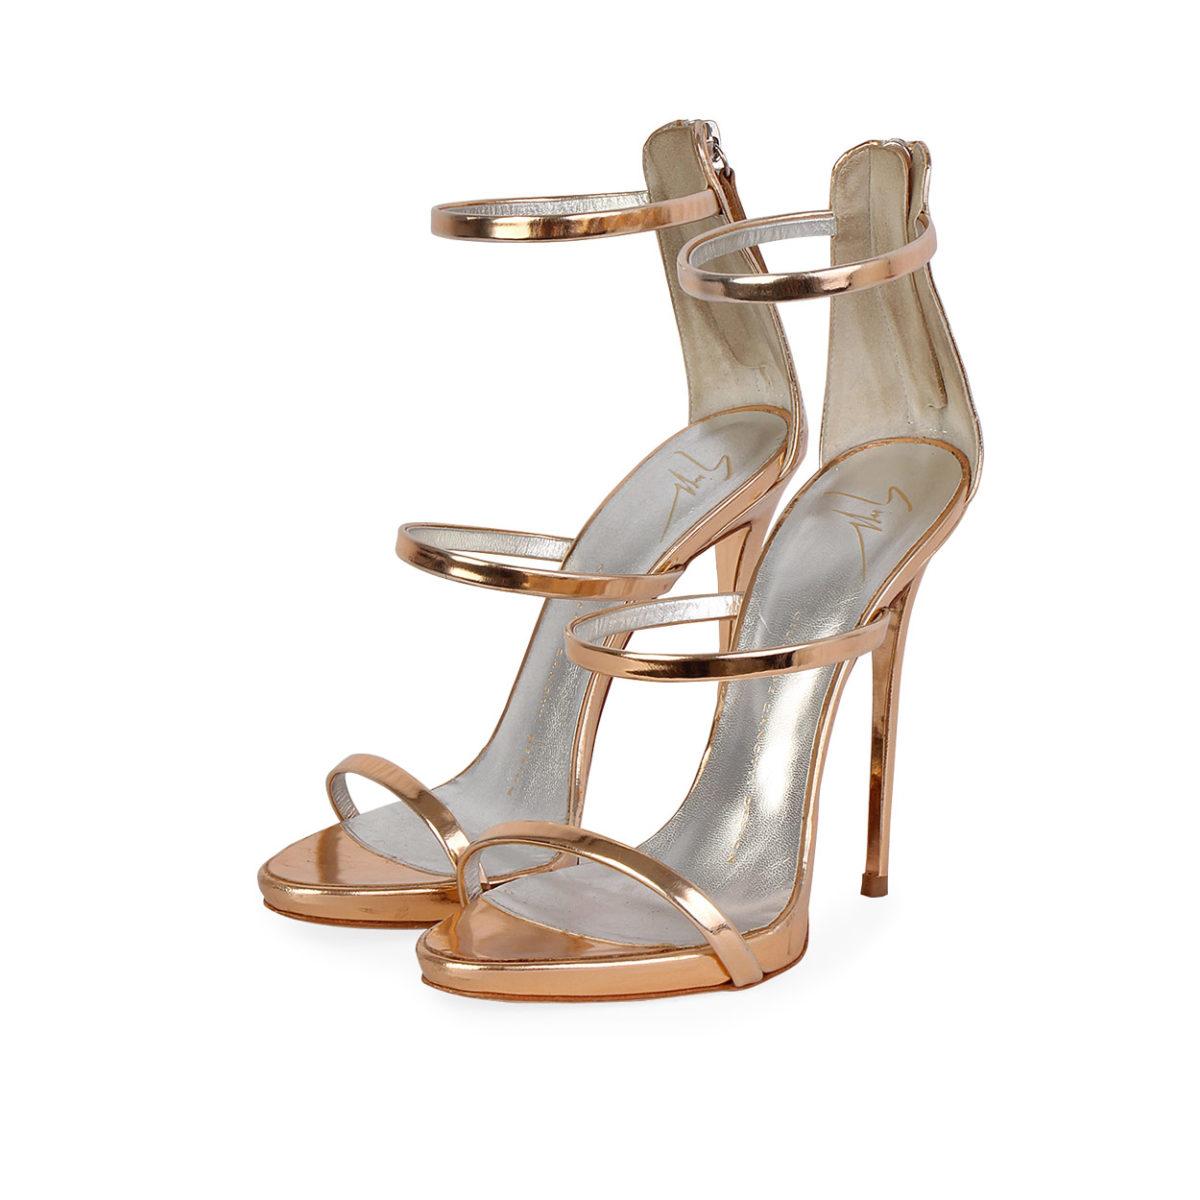 419ef57b3 GIUSEPPE ZANOTTI Metallic Leather Harmony Sandals Gold - S  37 (4 ...